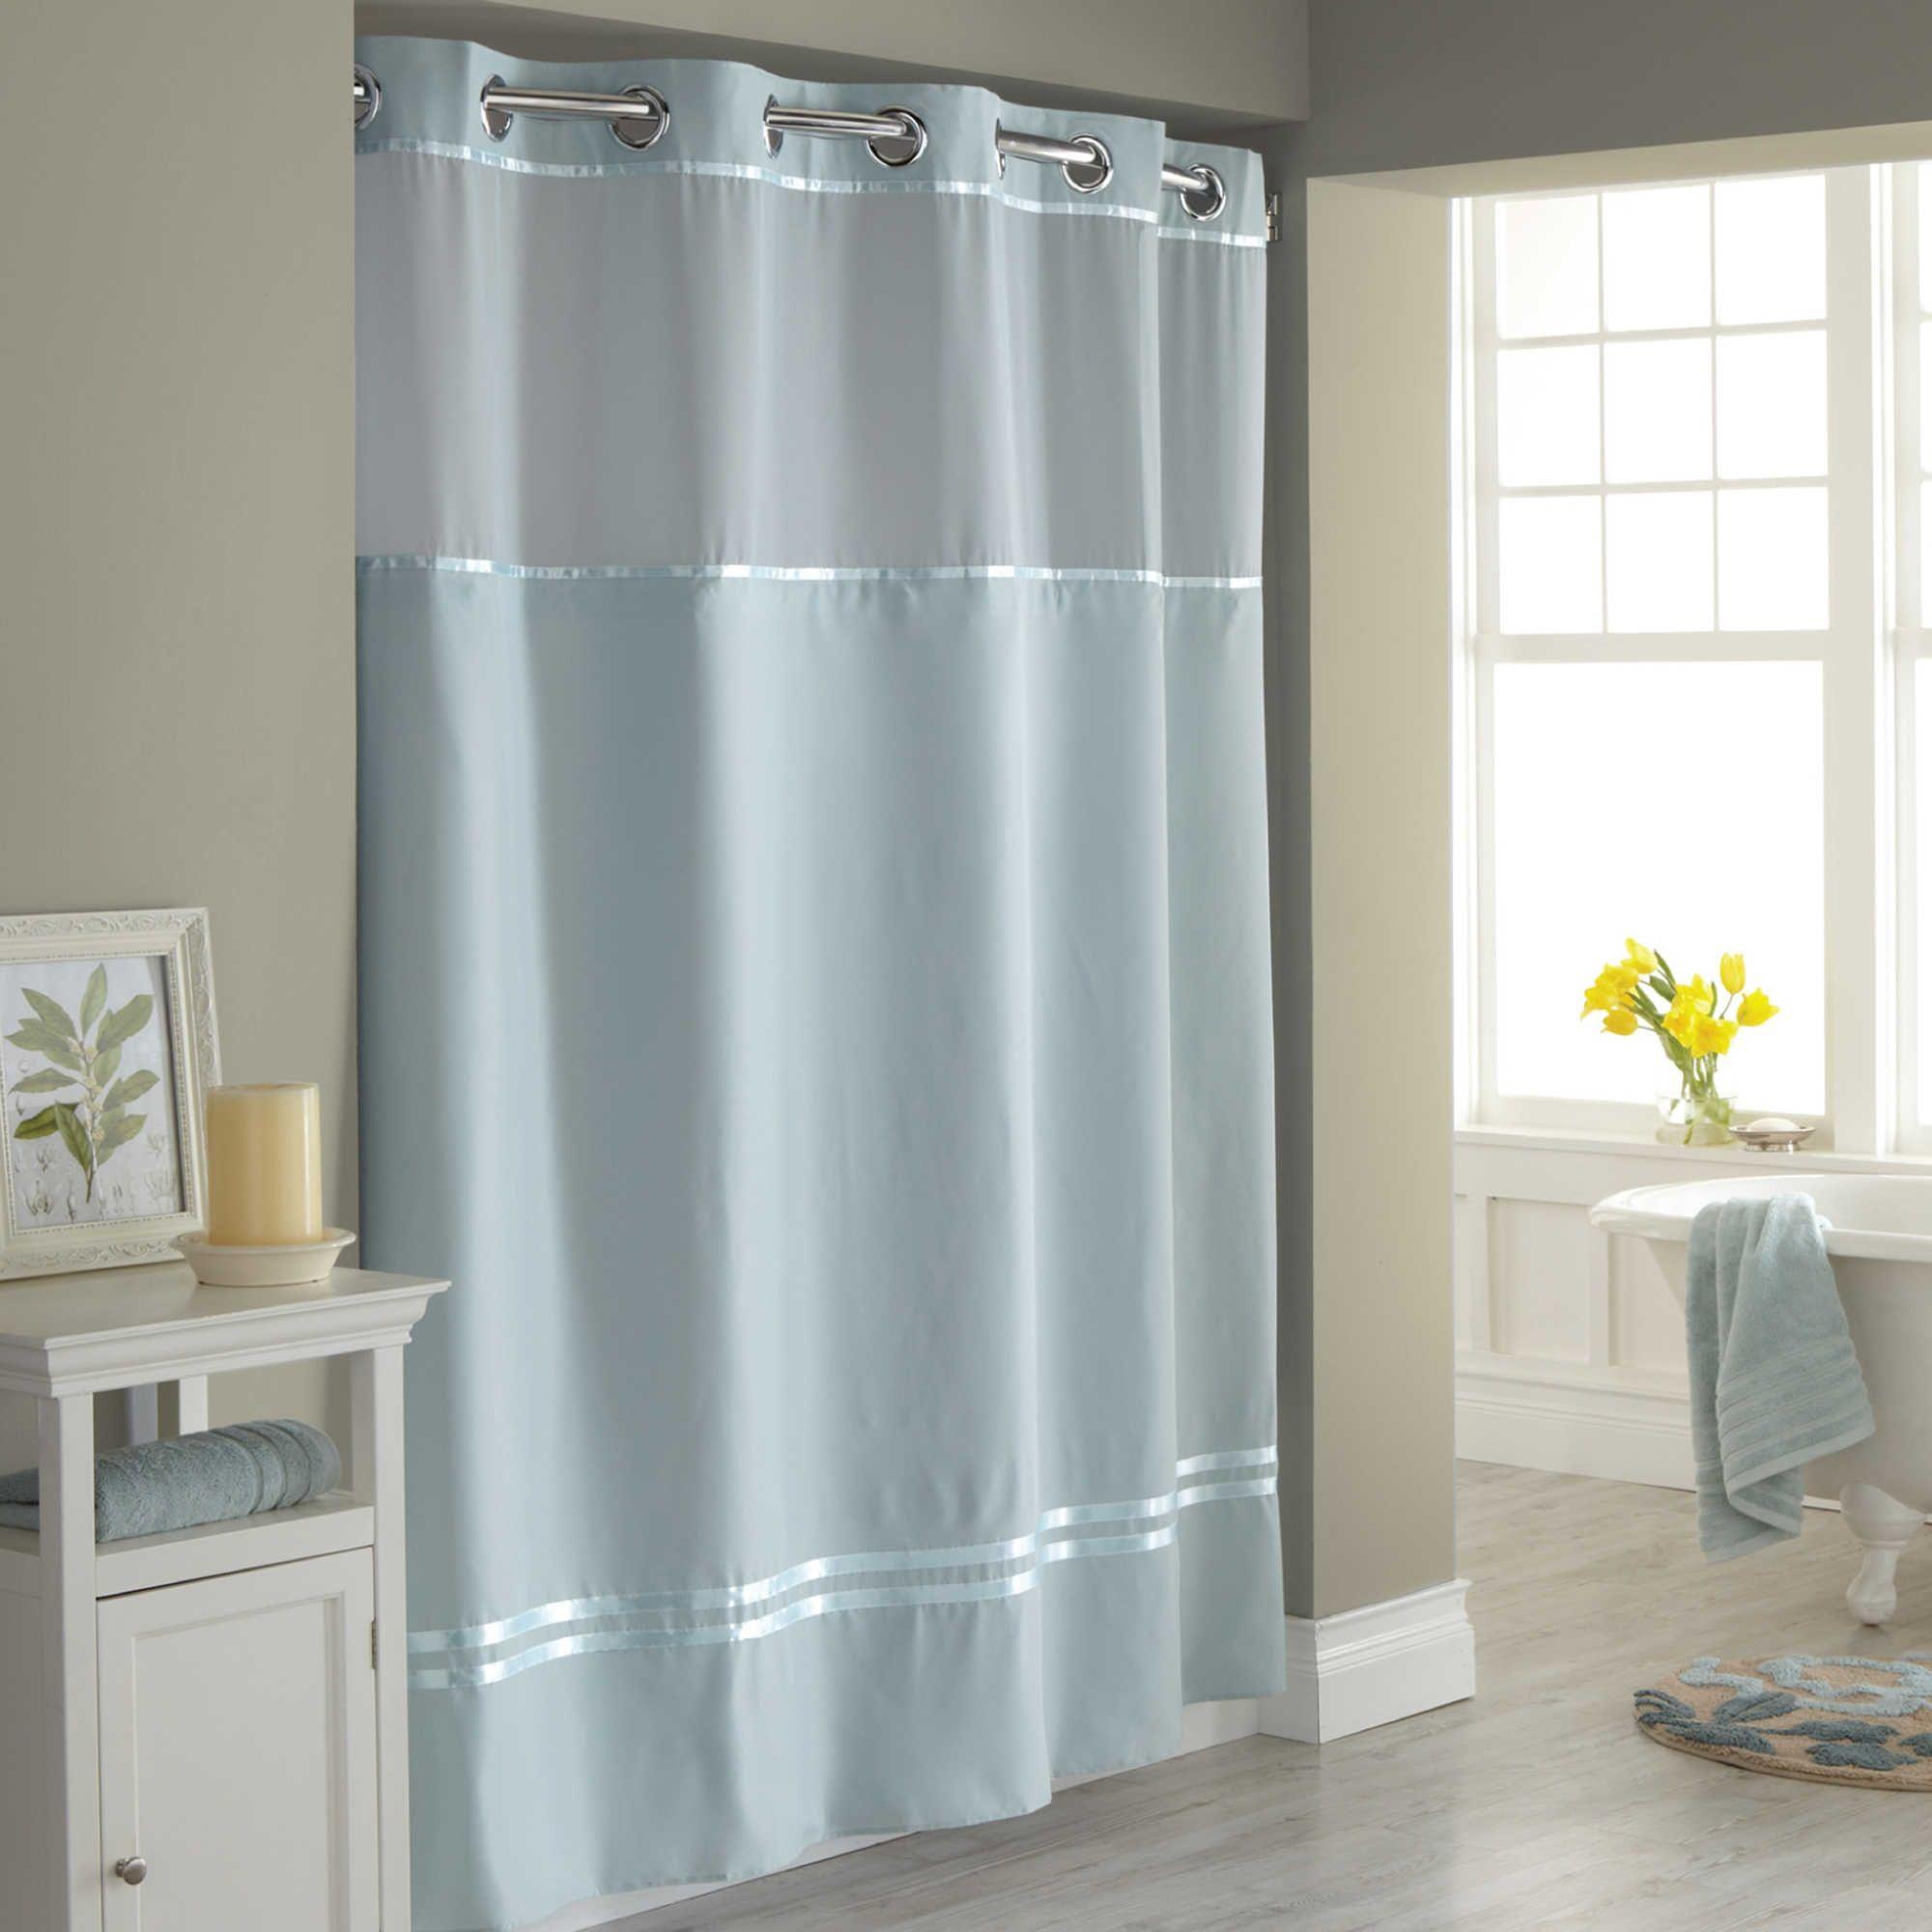 Nice shower curtains legalizecrew pinterest nice